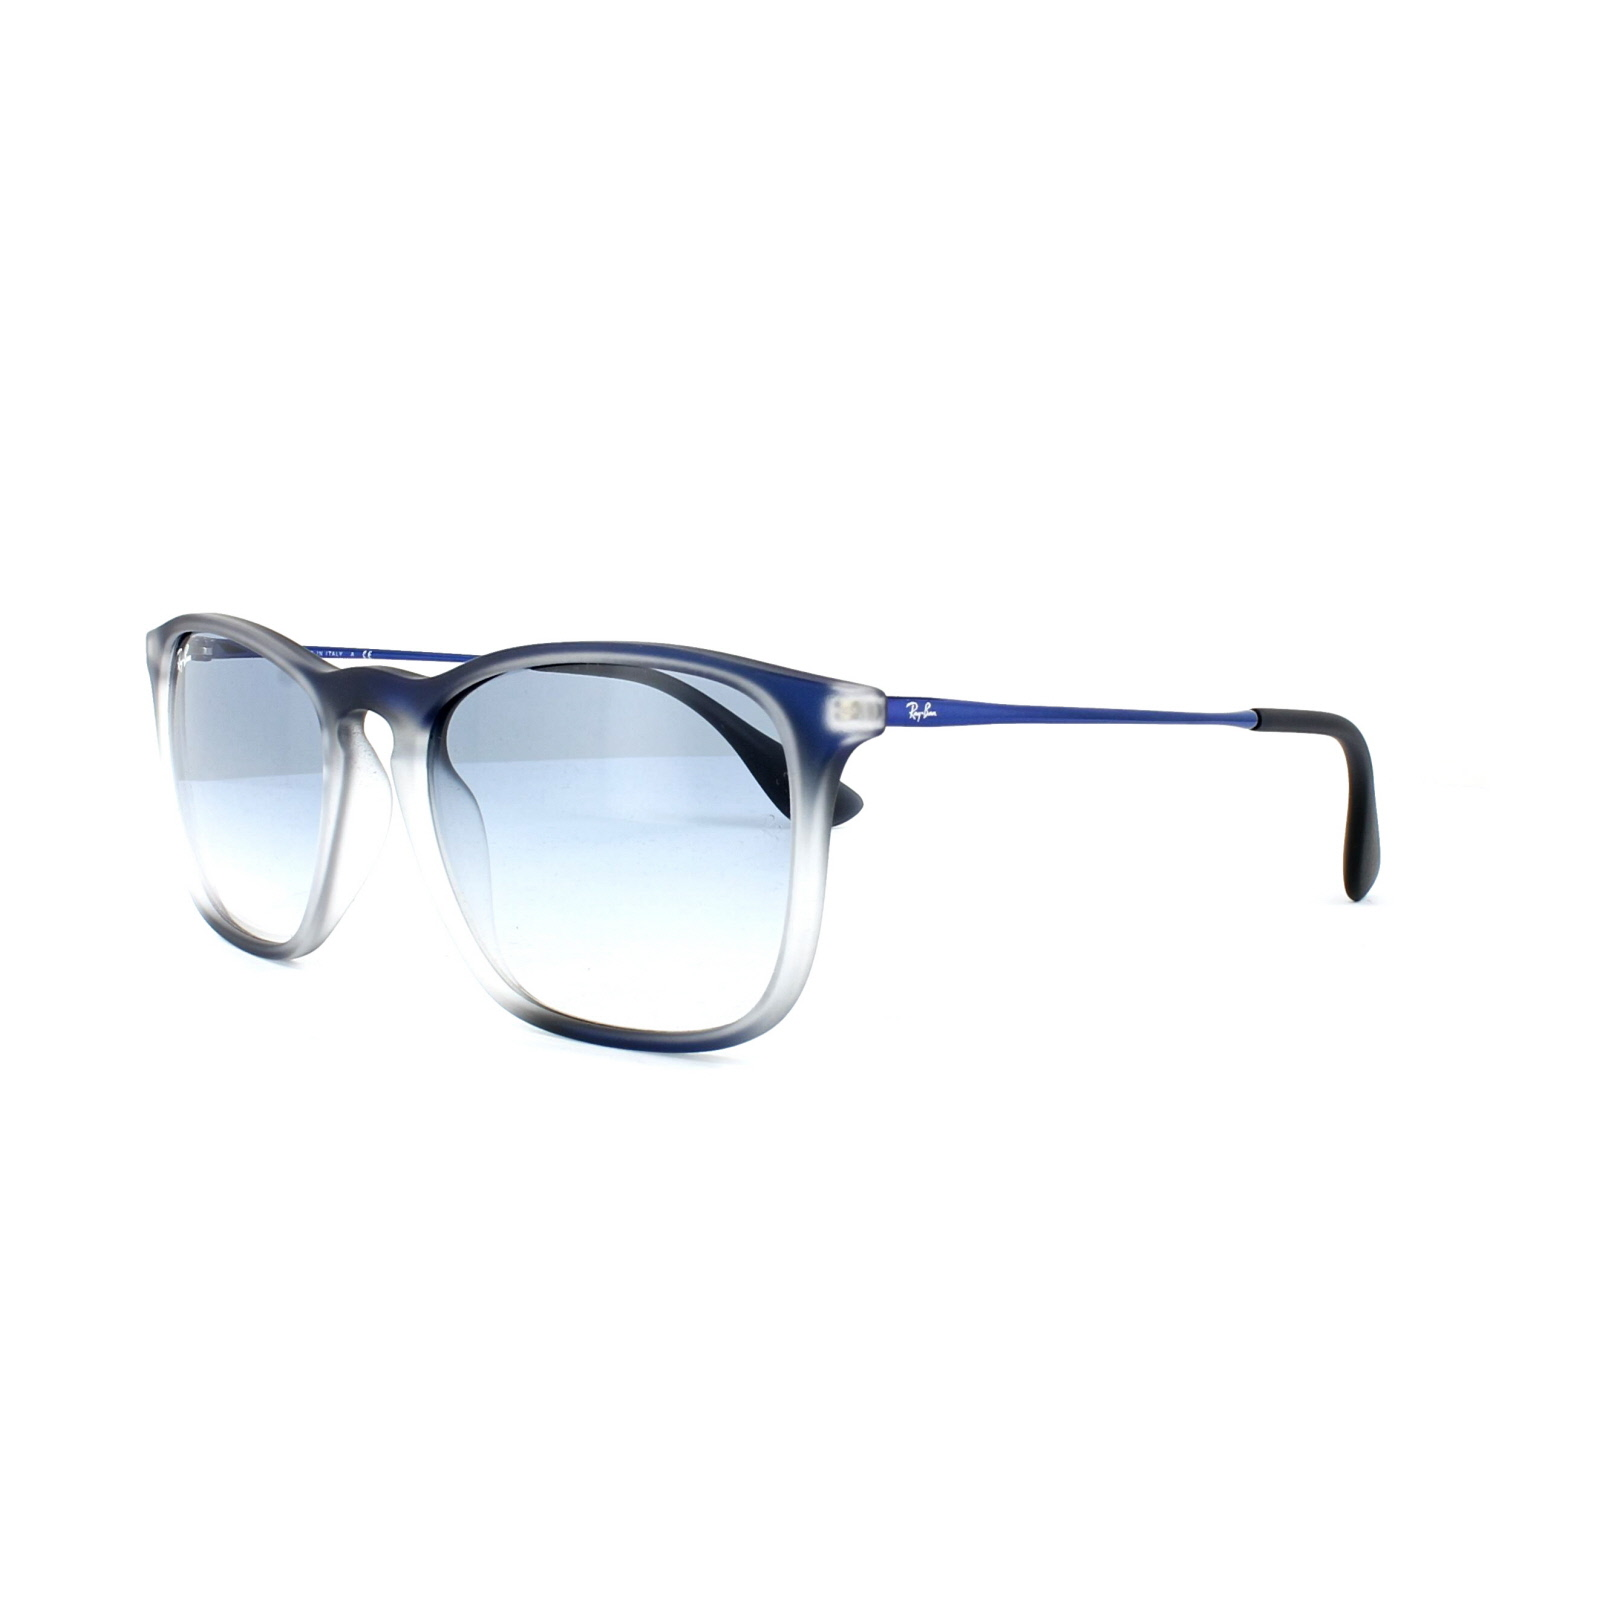 289fb39aac Sentinel Ray-Ban Sunglasses Chris 4187 622519 Blue   Grey Light Blue  Gradient